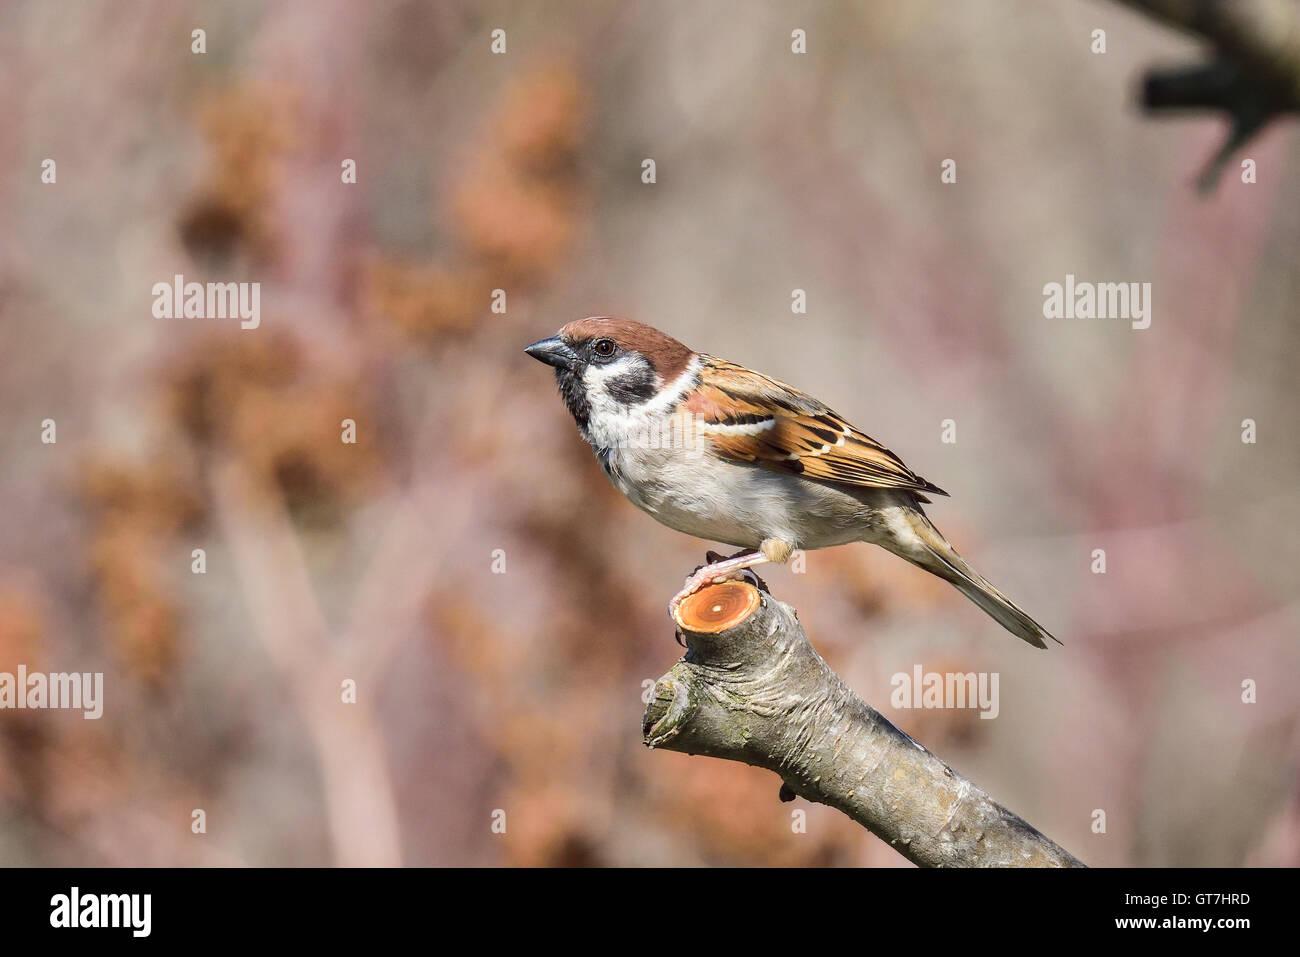 Eurasische Tree sparrow Stockfoto